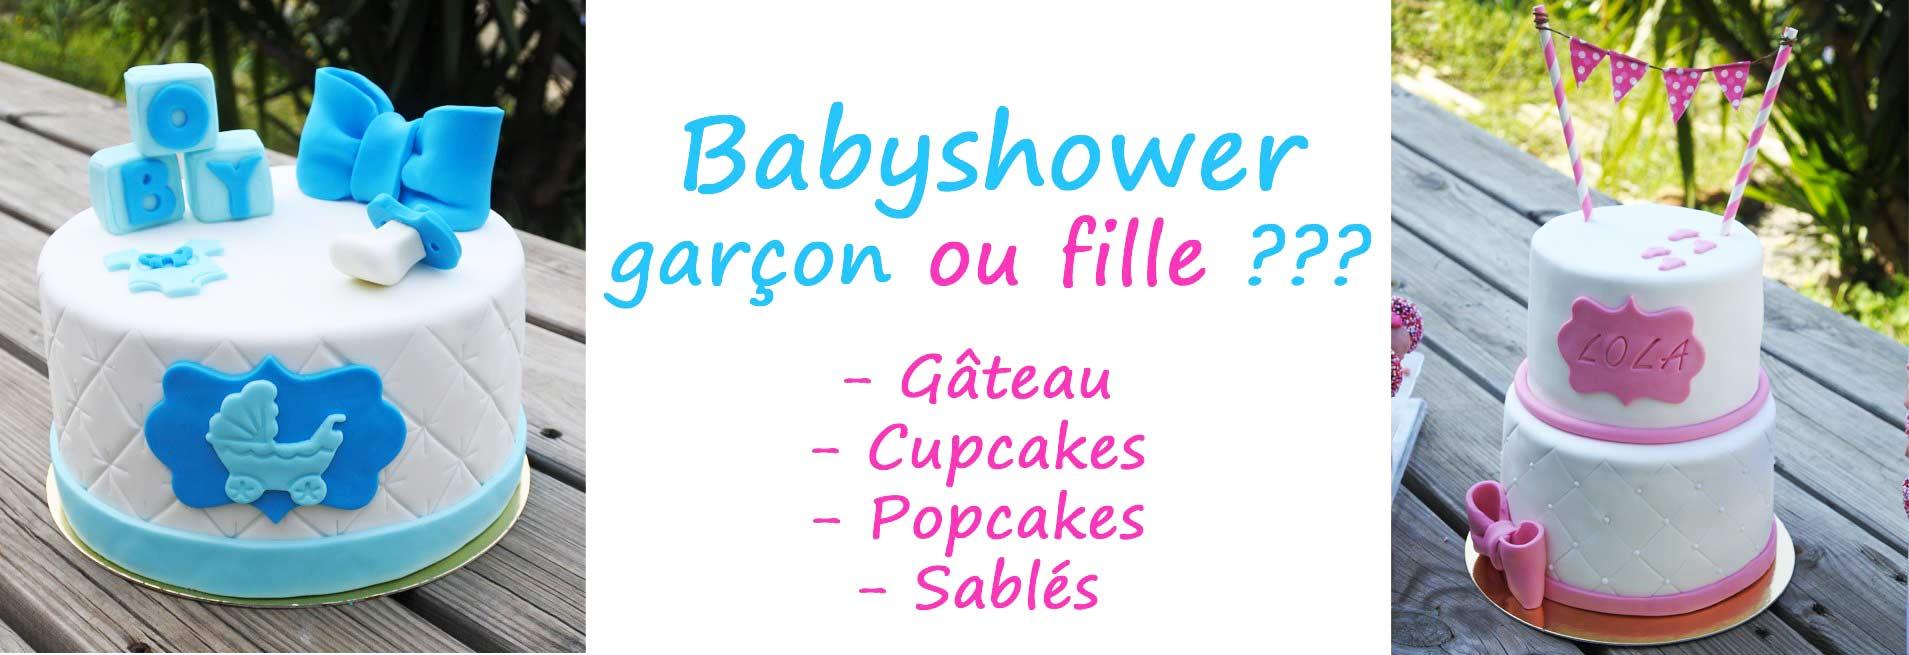 Création gâteau Babyshower Montpellier